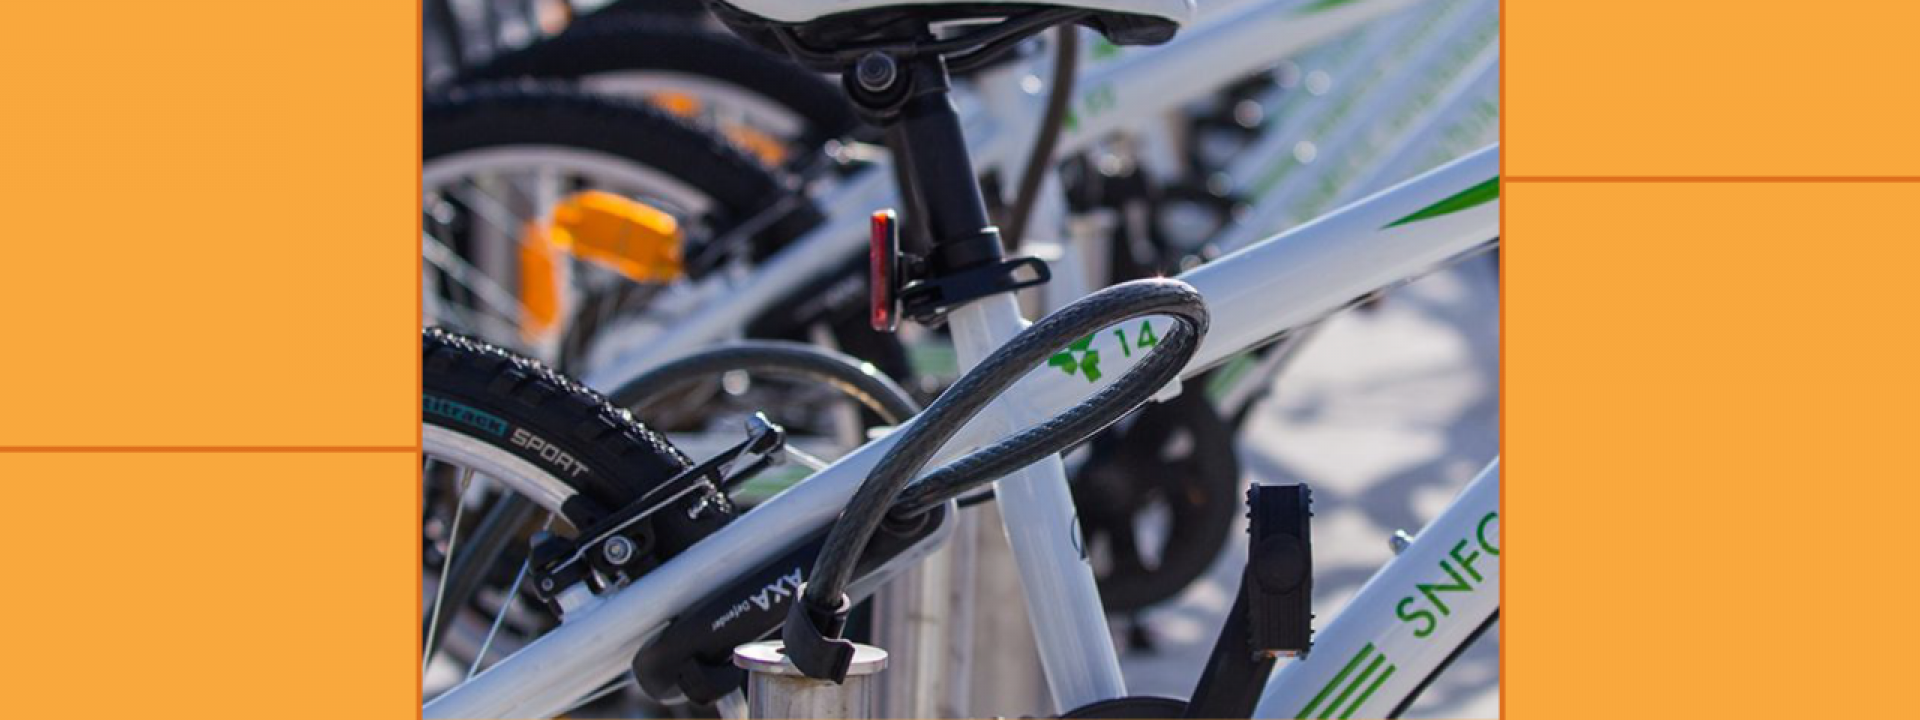 Members' Events: Γνωριμία με τα e-bikes | Ευρωπαϊκή Εβδομάδα Κινητικότητας - Εικόνα